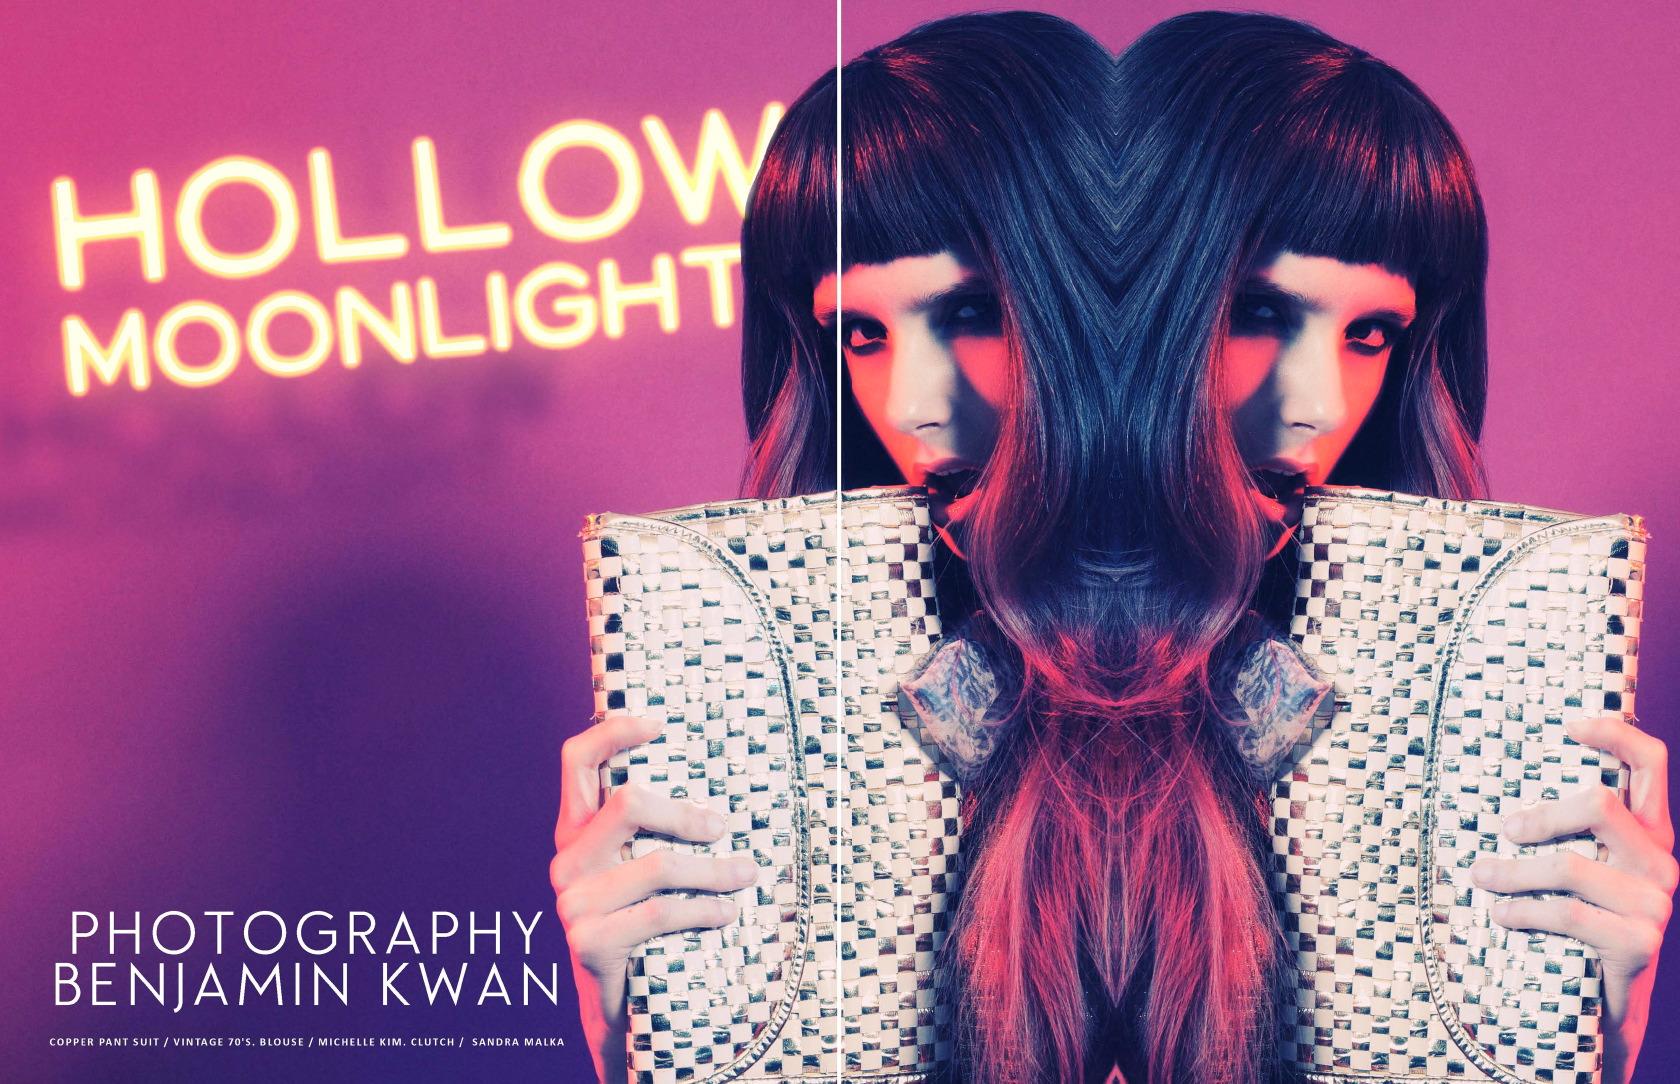 Benjamin Kwan Photography HOLLOW